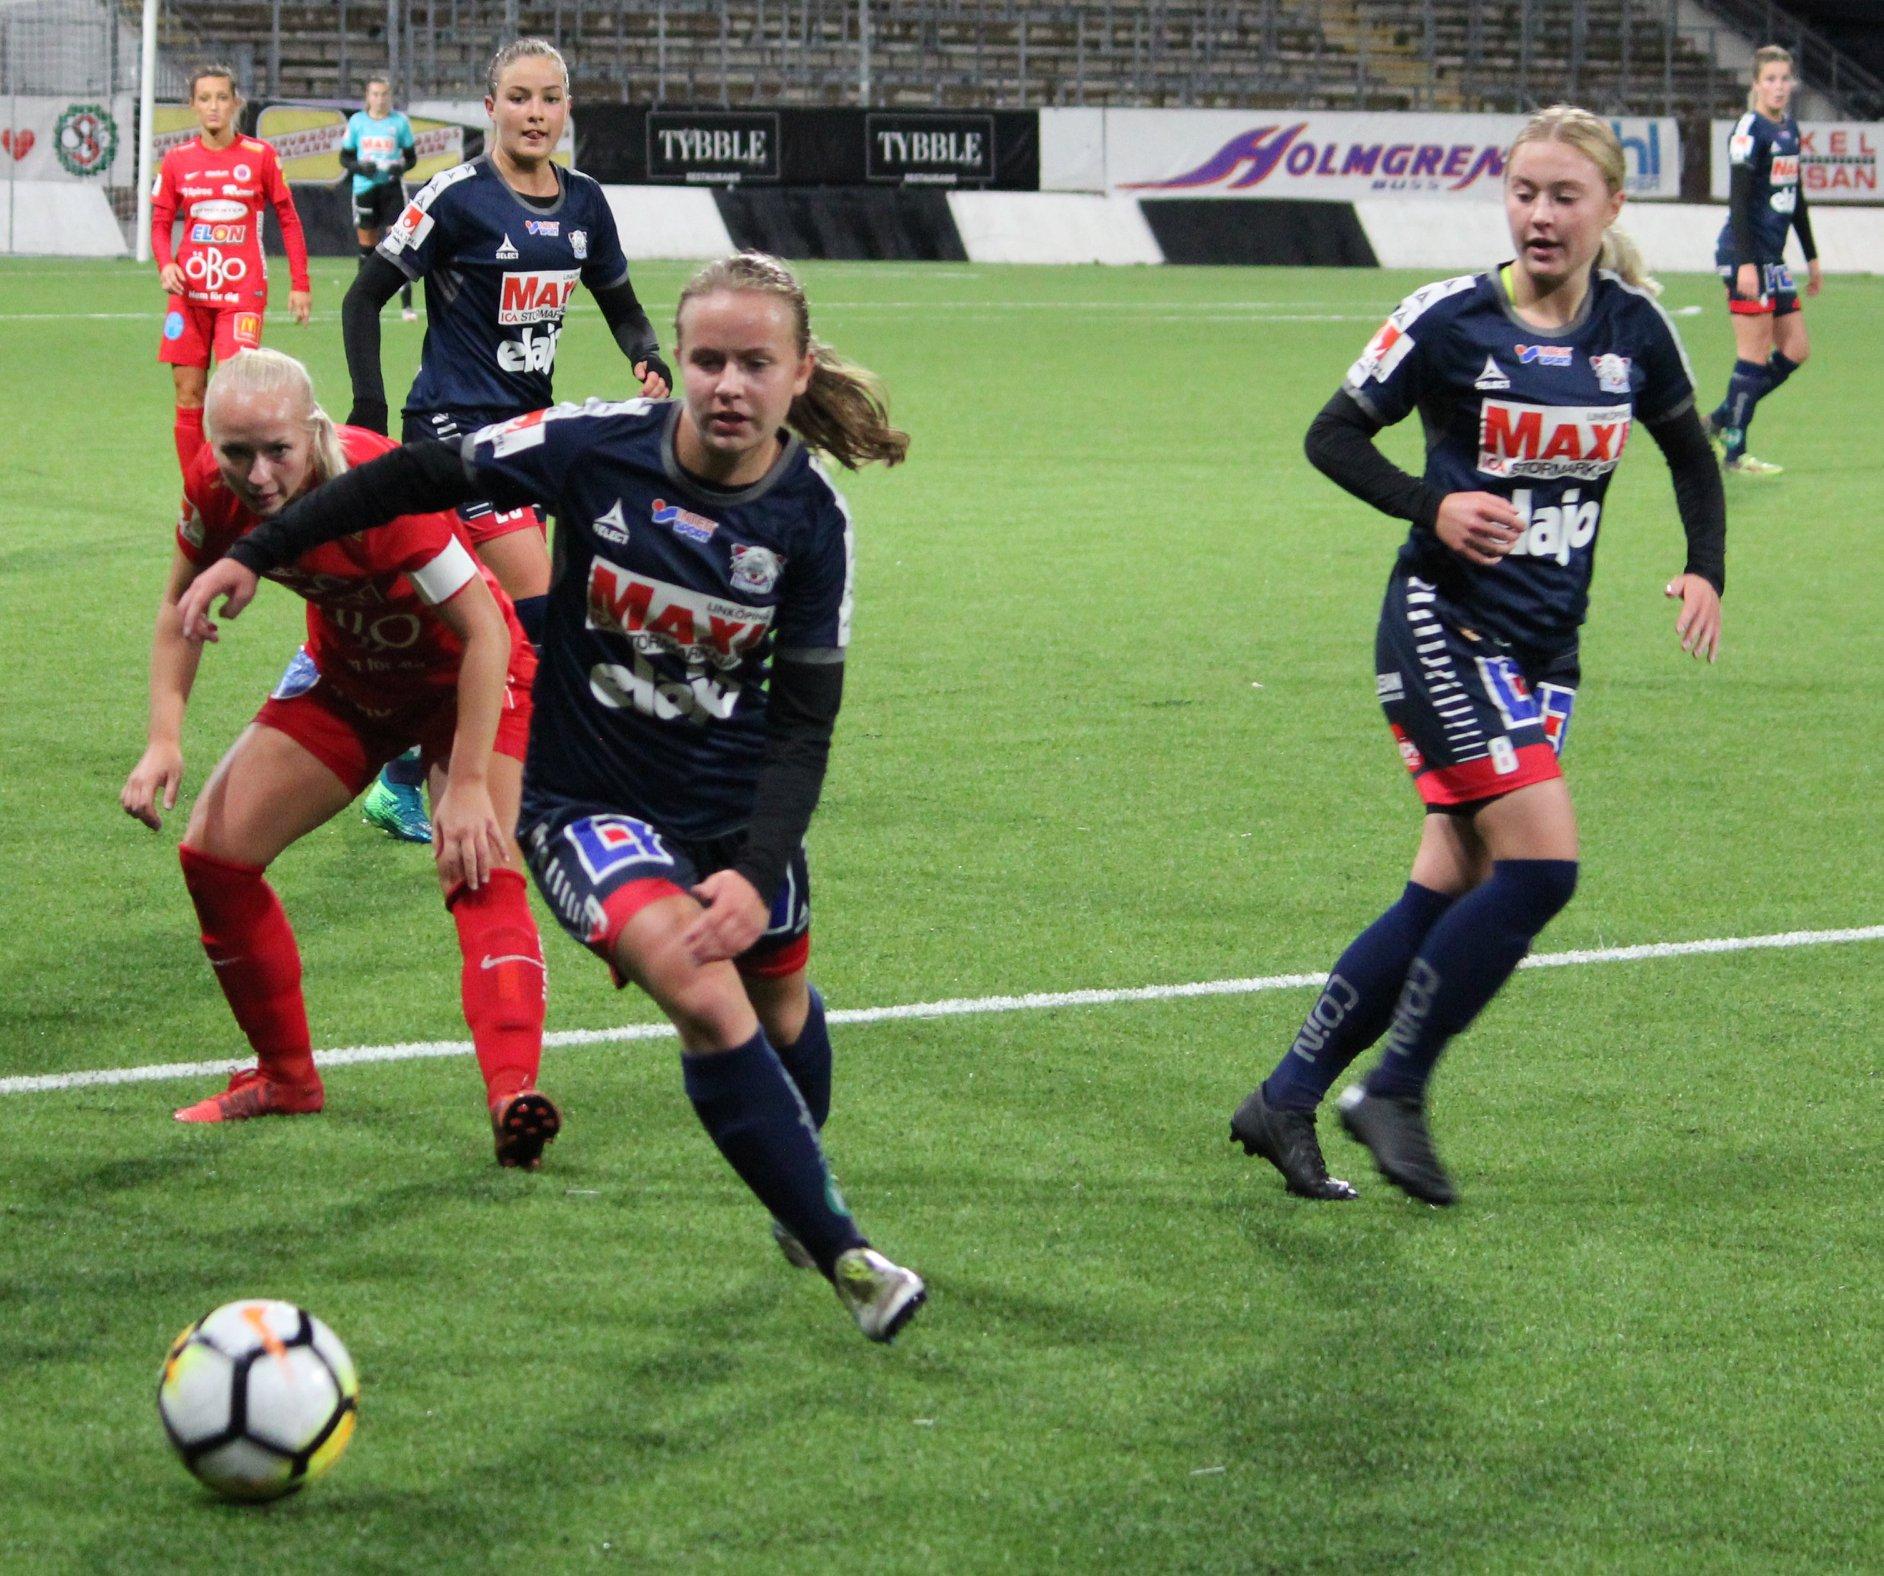 Bortamöte KIF Örebro - Linköpings Fotboll Club 69fd1082a4044